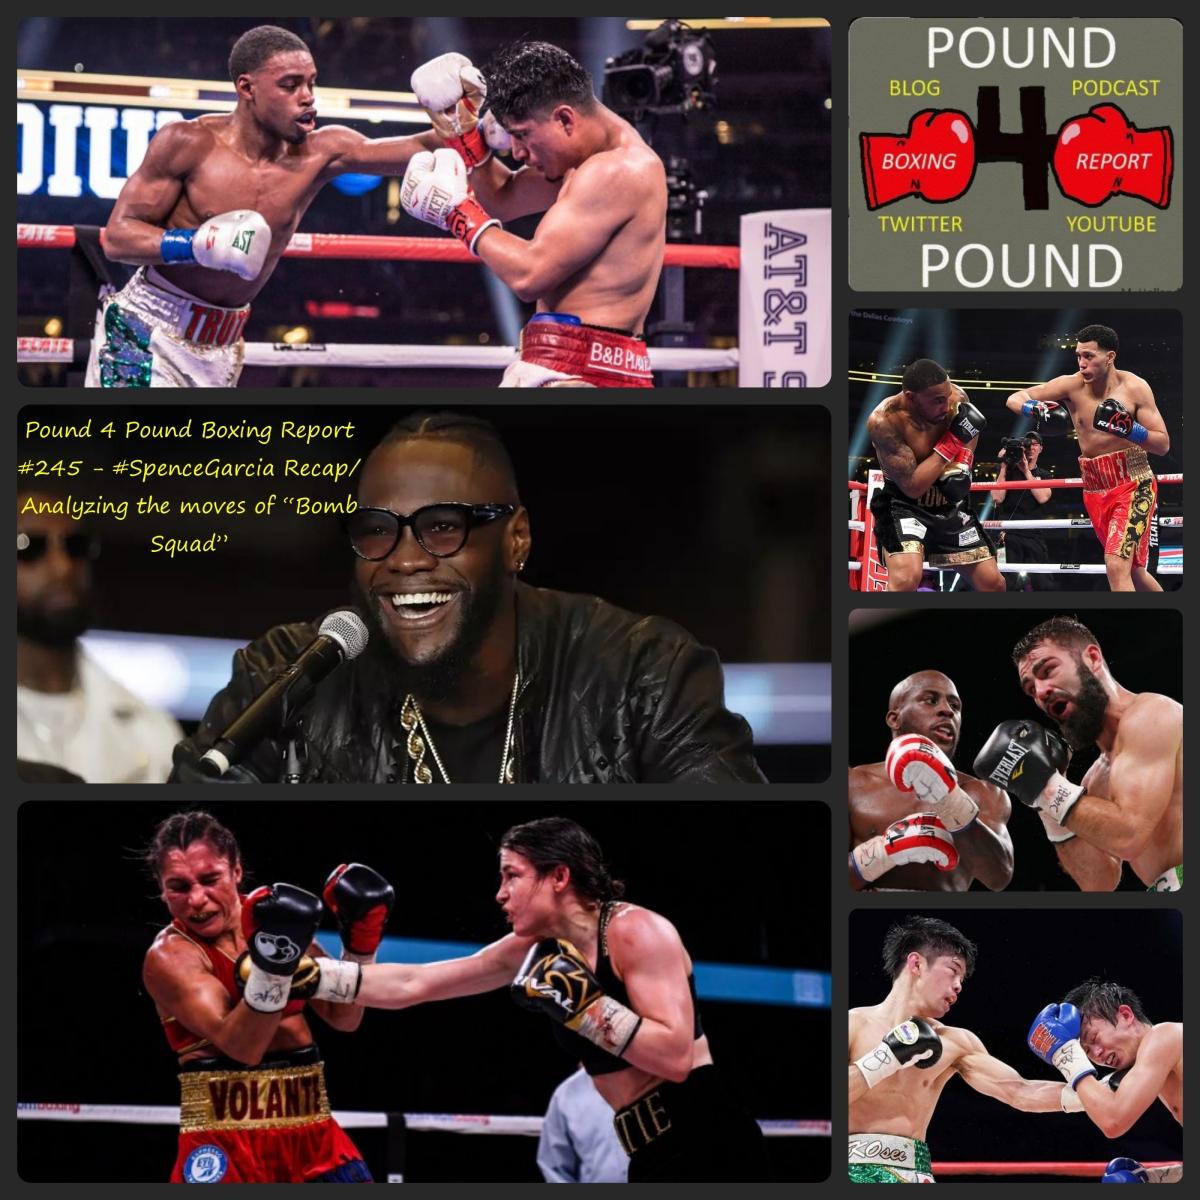 Pound 4 Pound Boxing Report #245